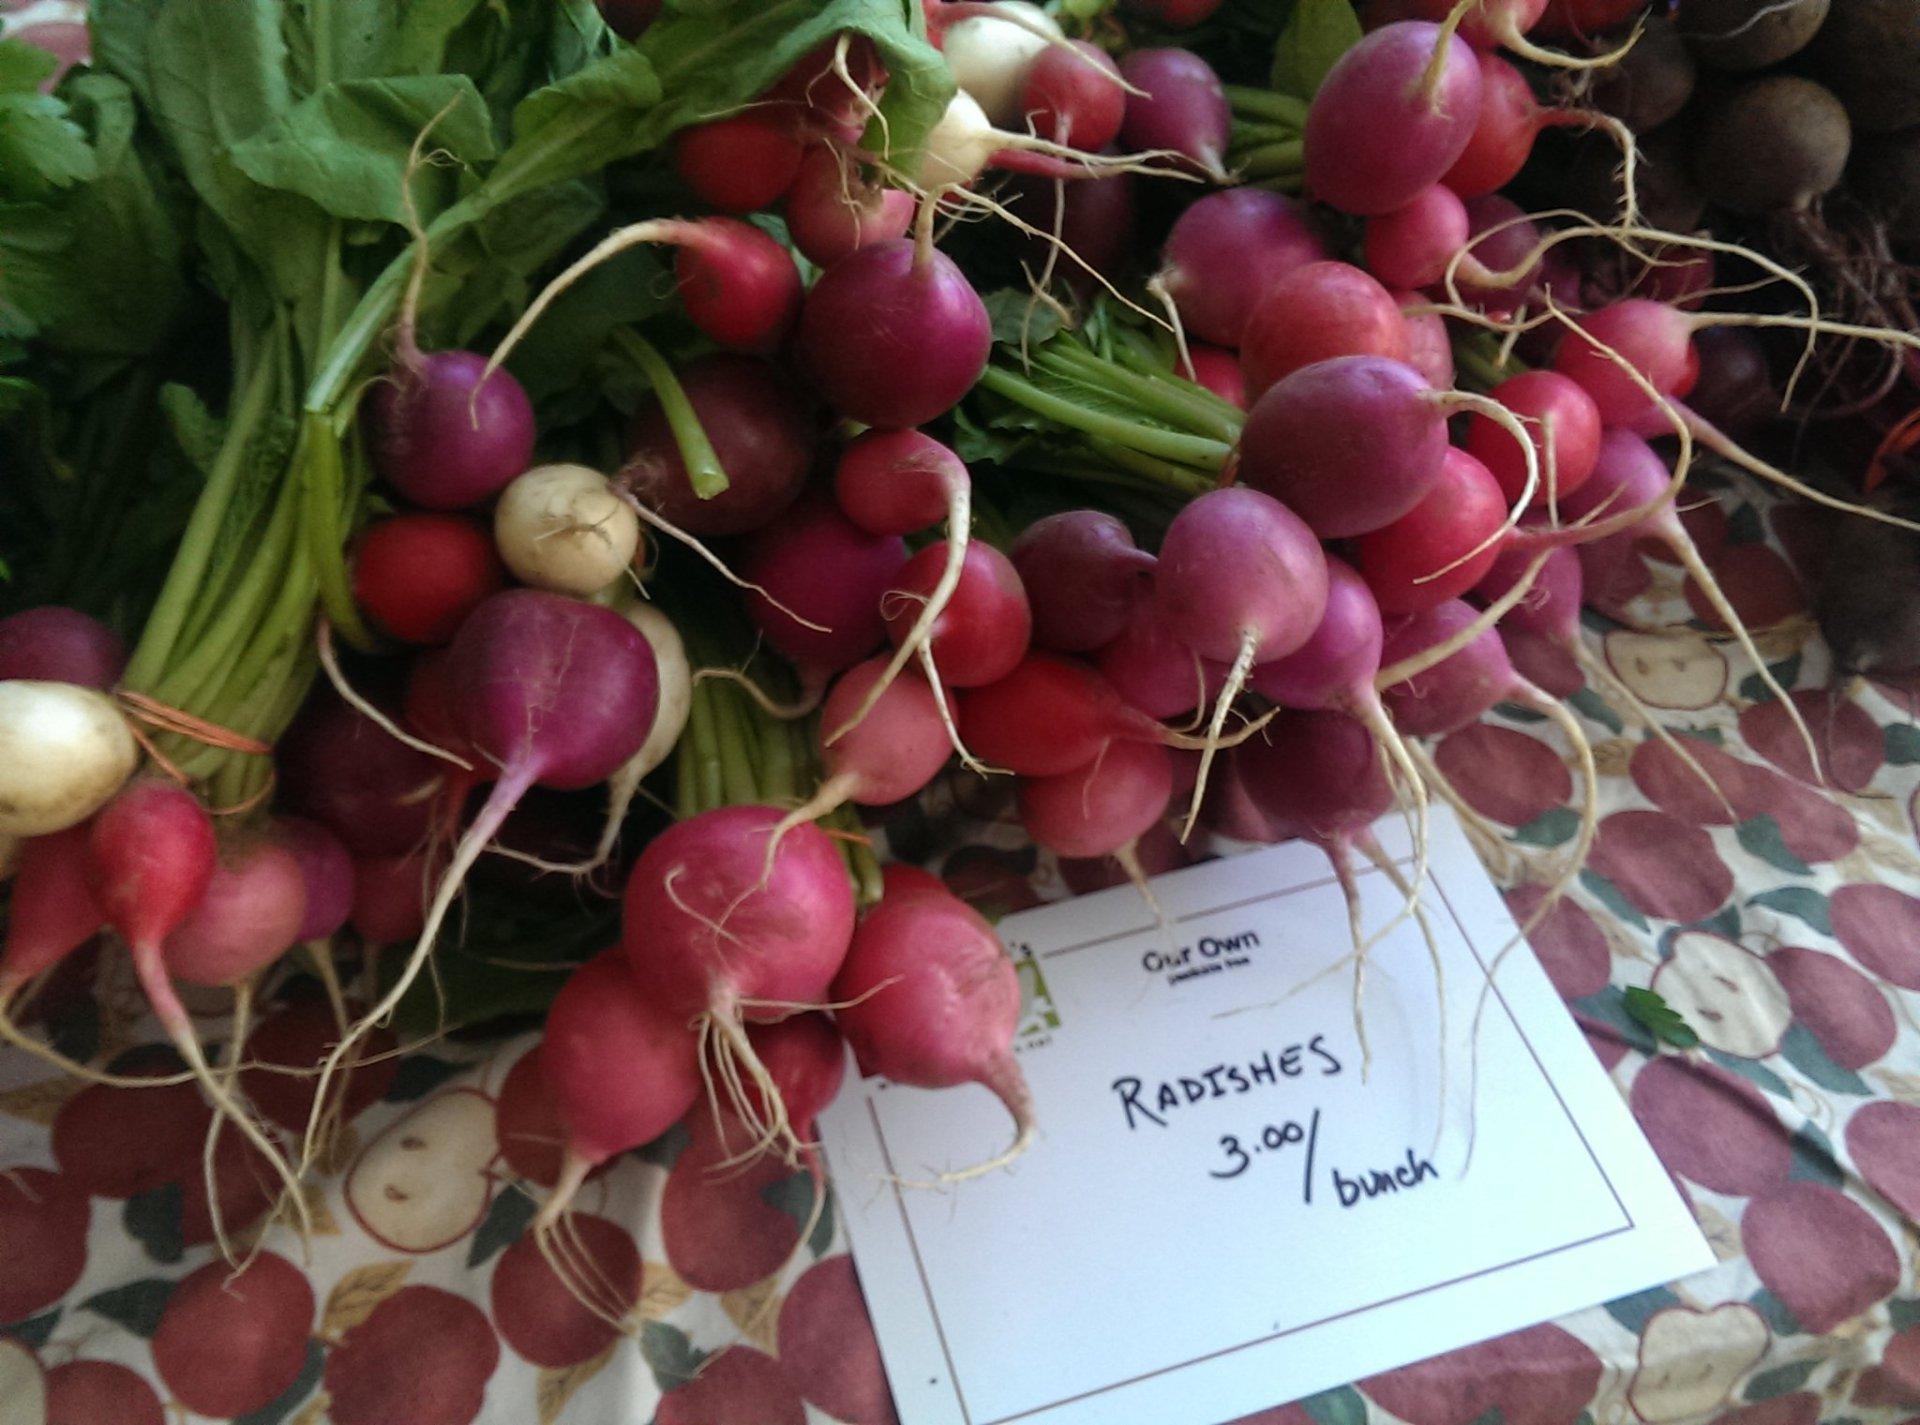 Andover Farmers' Market